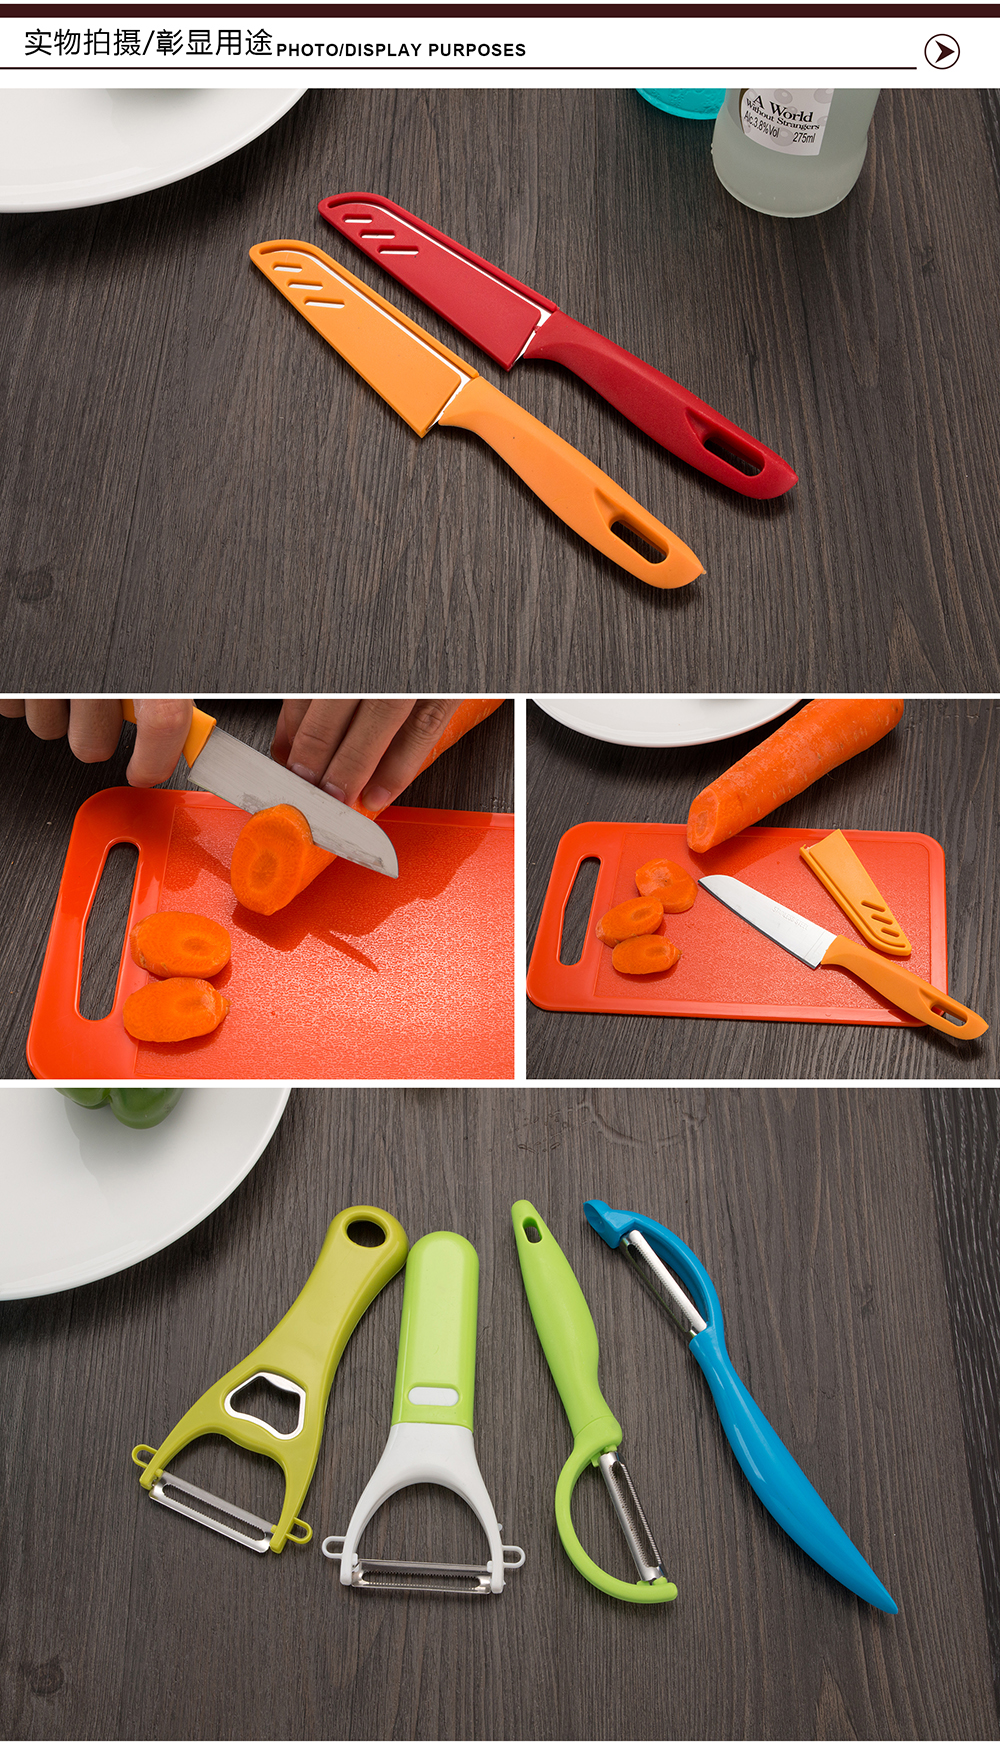 5PCS Vegetable Fruit Peeler Bottle Opener Fruit knife Set Carrot Potato Peeler Melon turnip Slicer Cutter Kitchen Cooking Tools 6